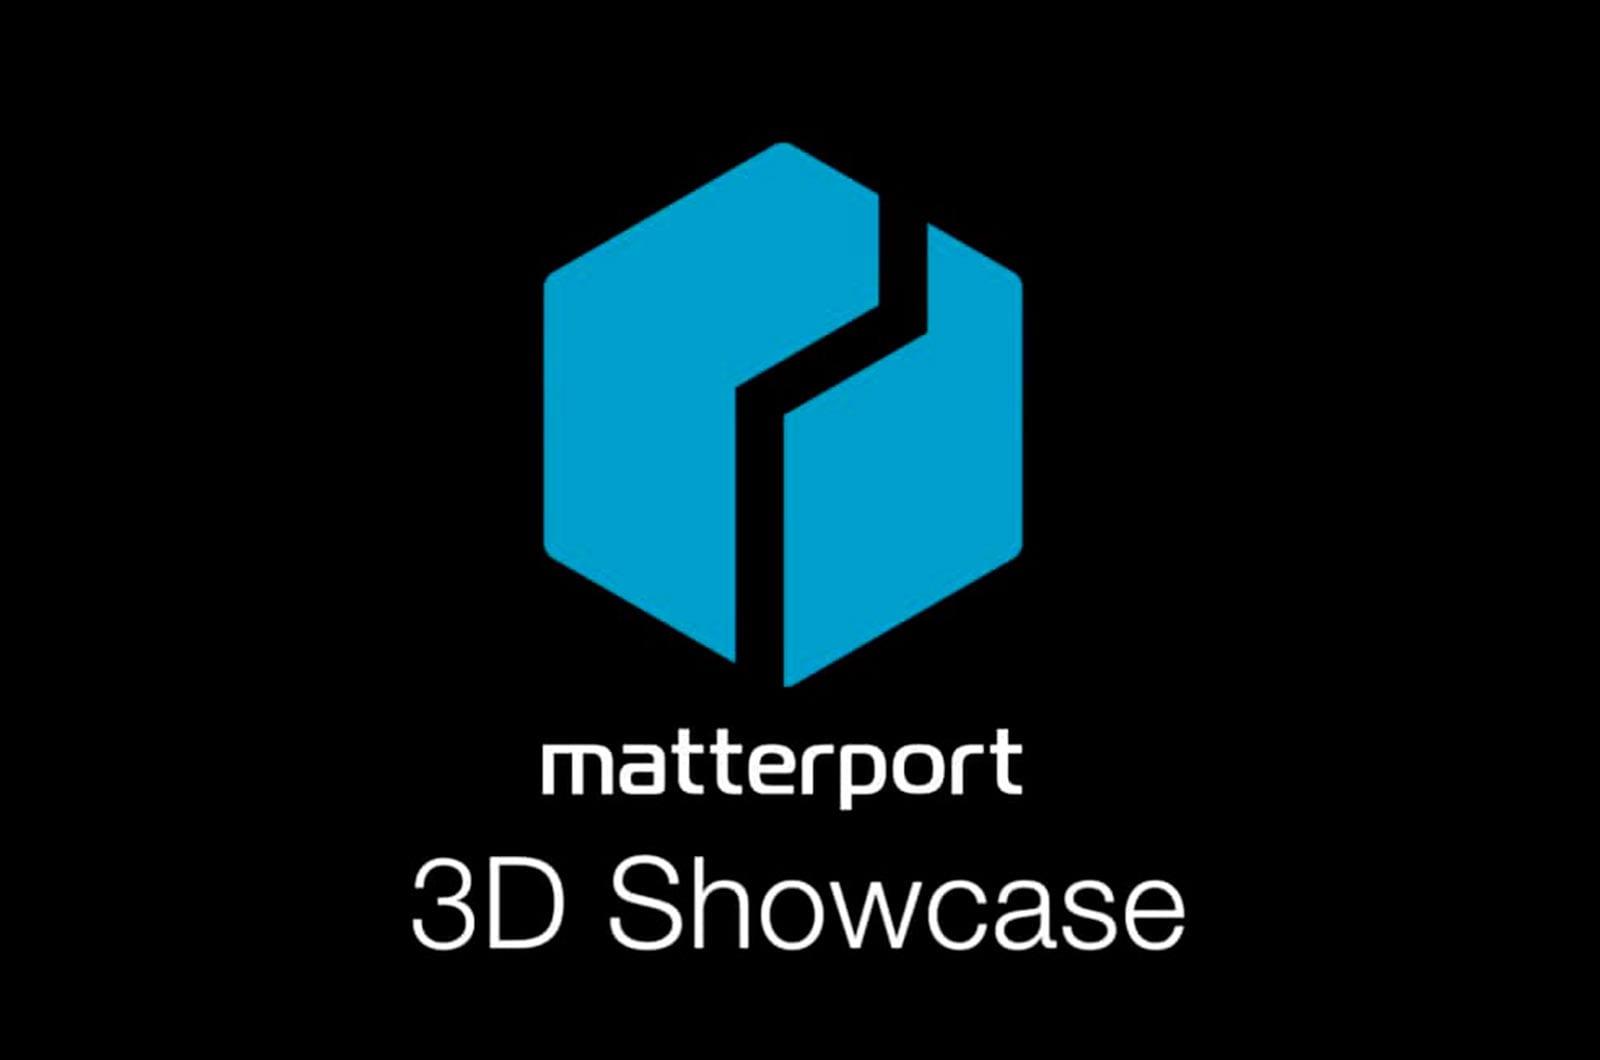 Matterport-3D-Tours-Featured-Image | 3D Visualization | Matterport 3D Tours